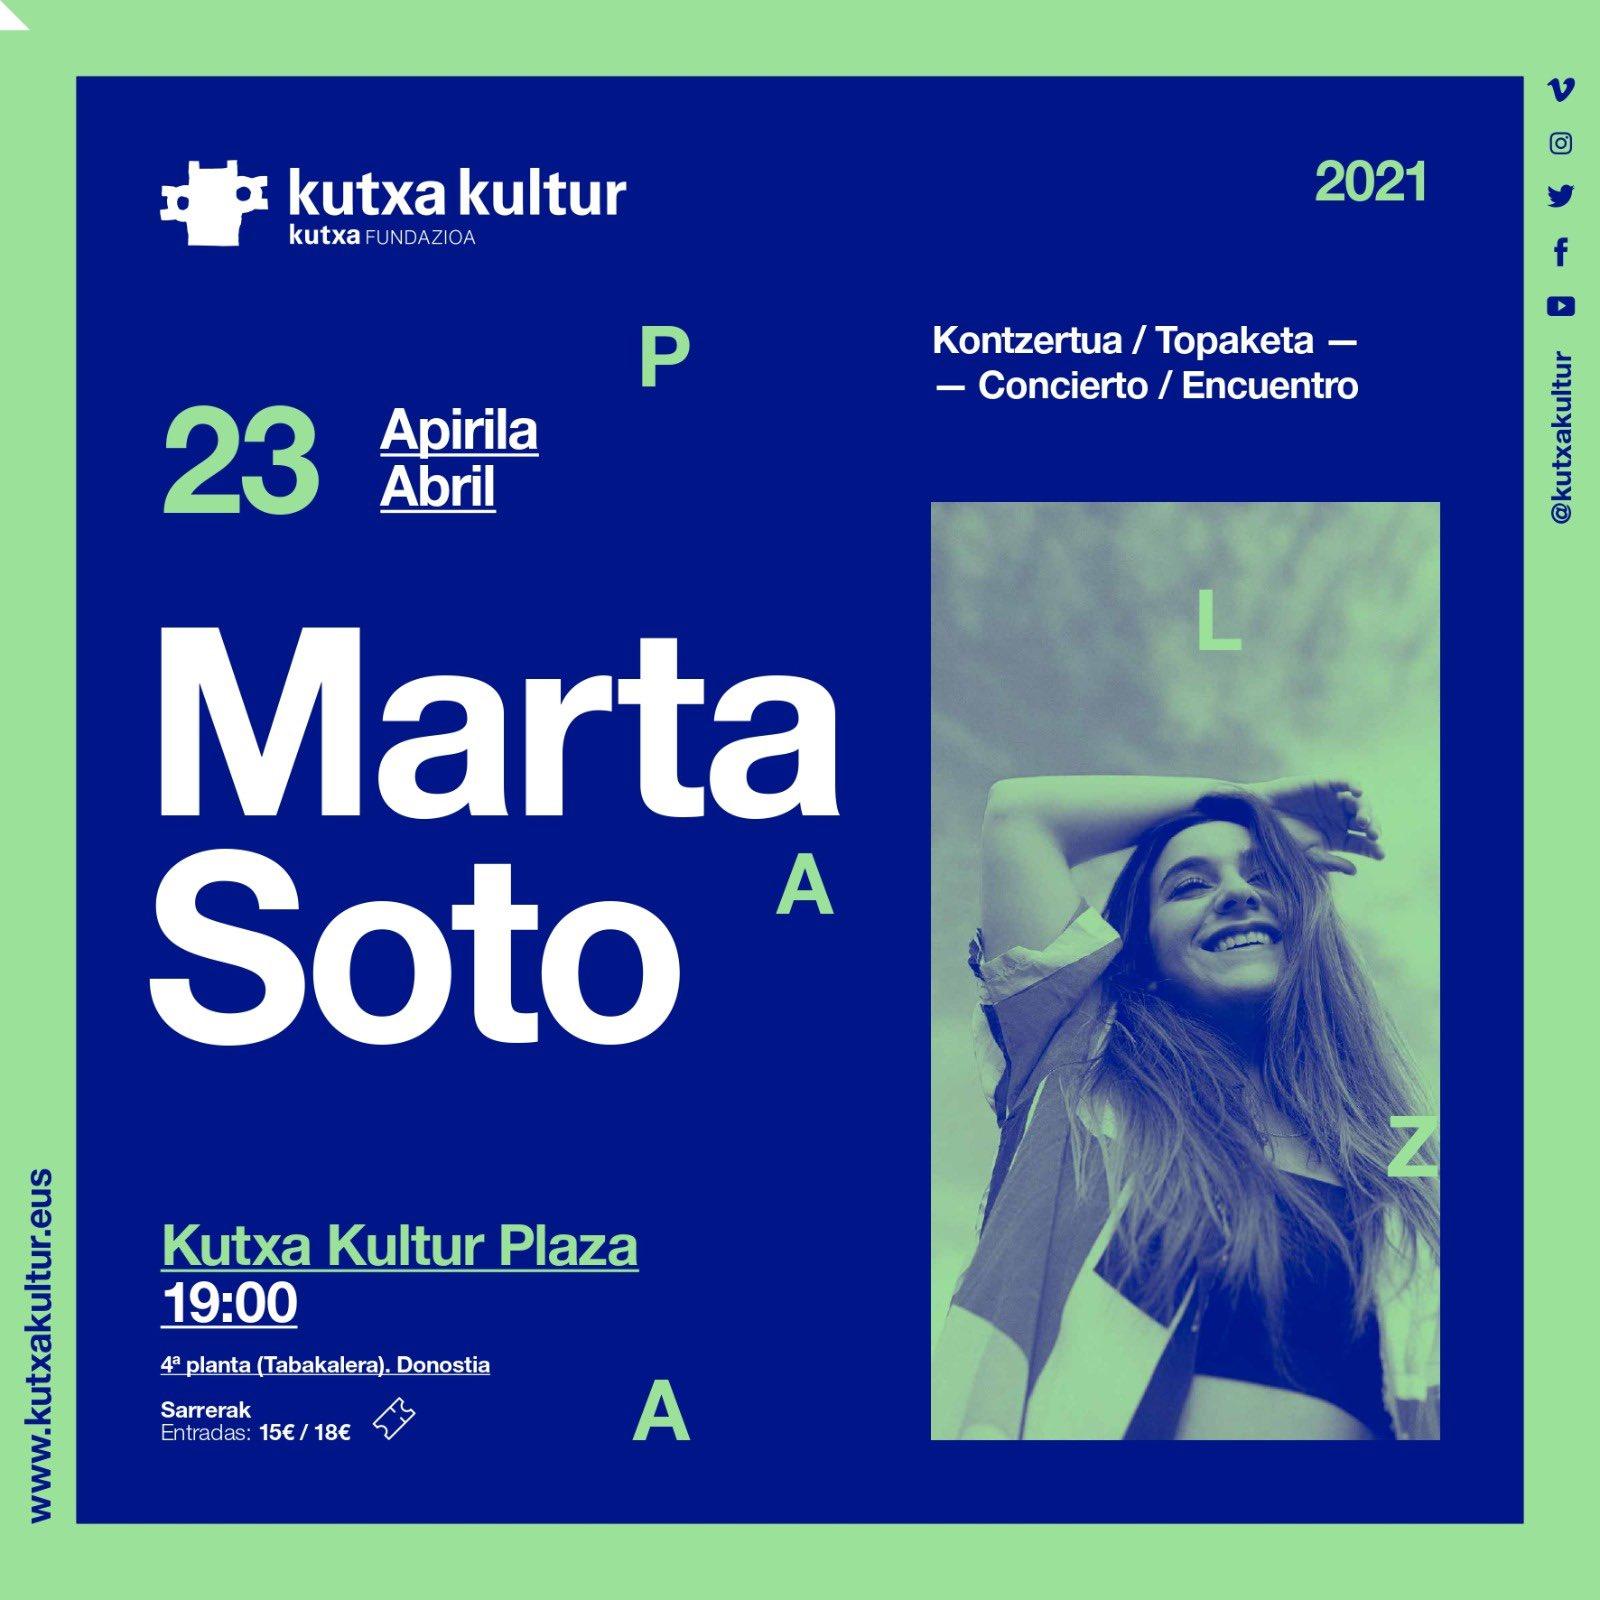 Cartel del concierto. Foto: Kutxa kultur